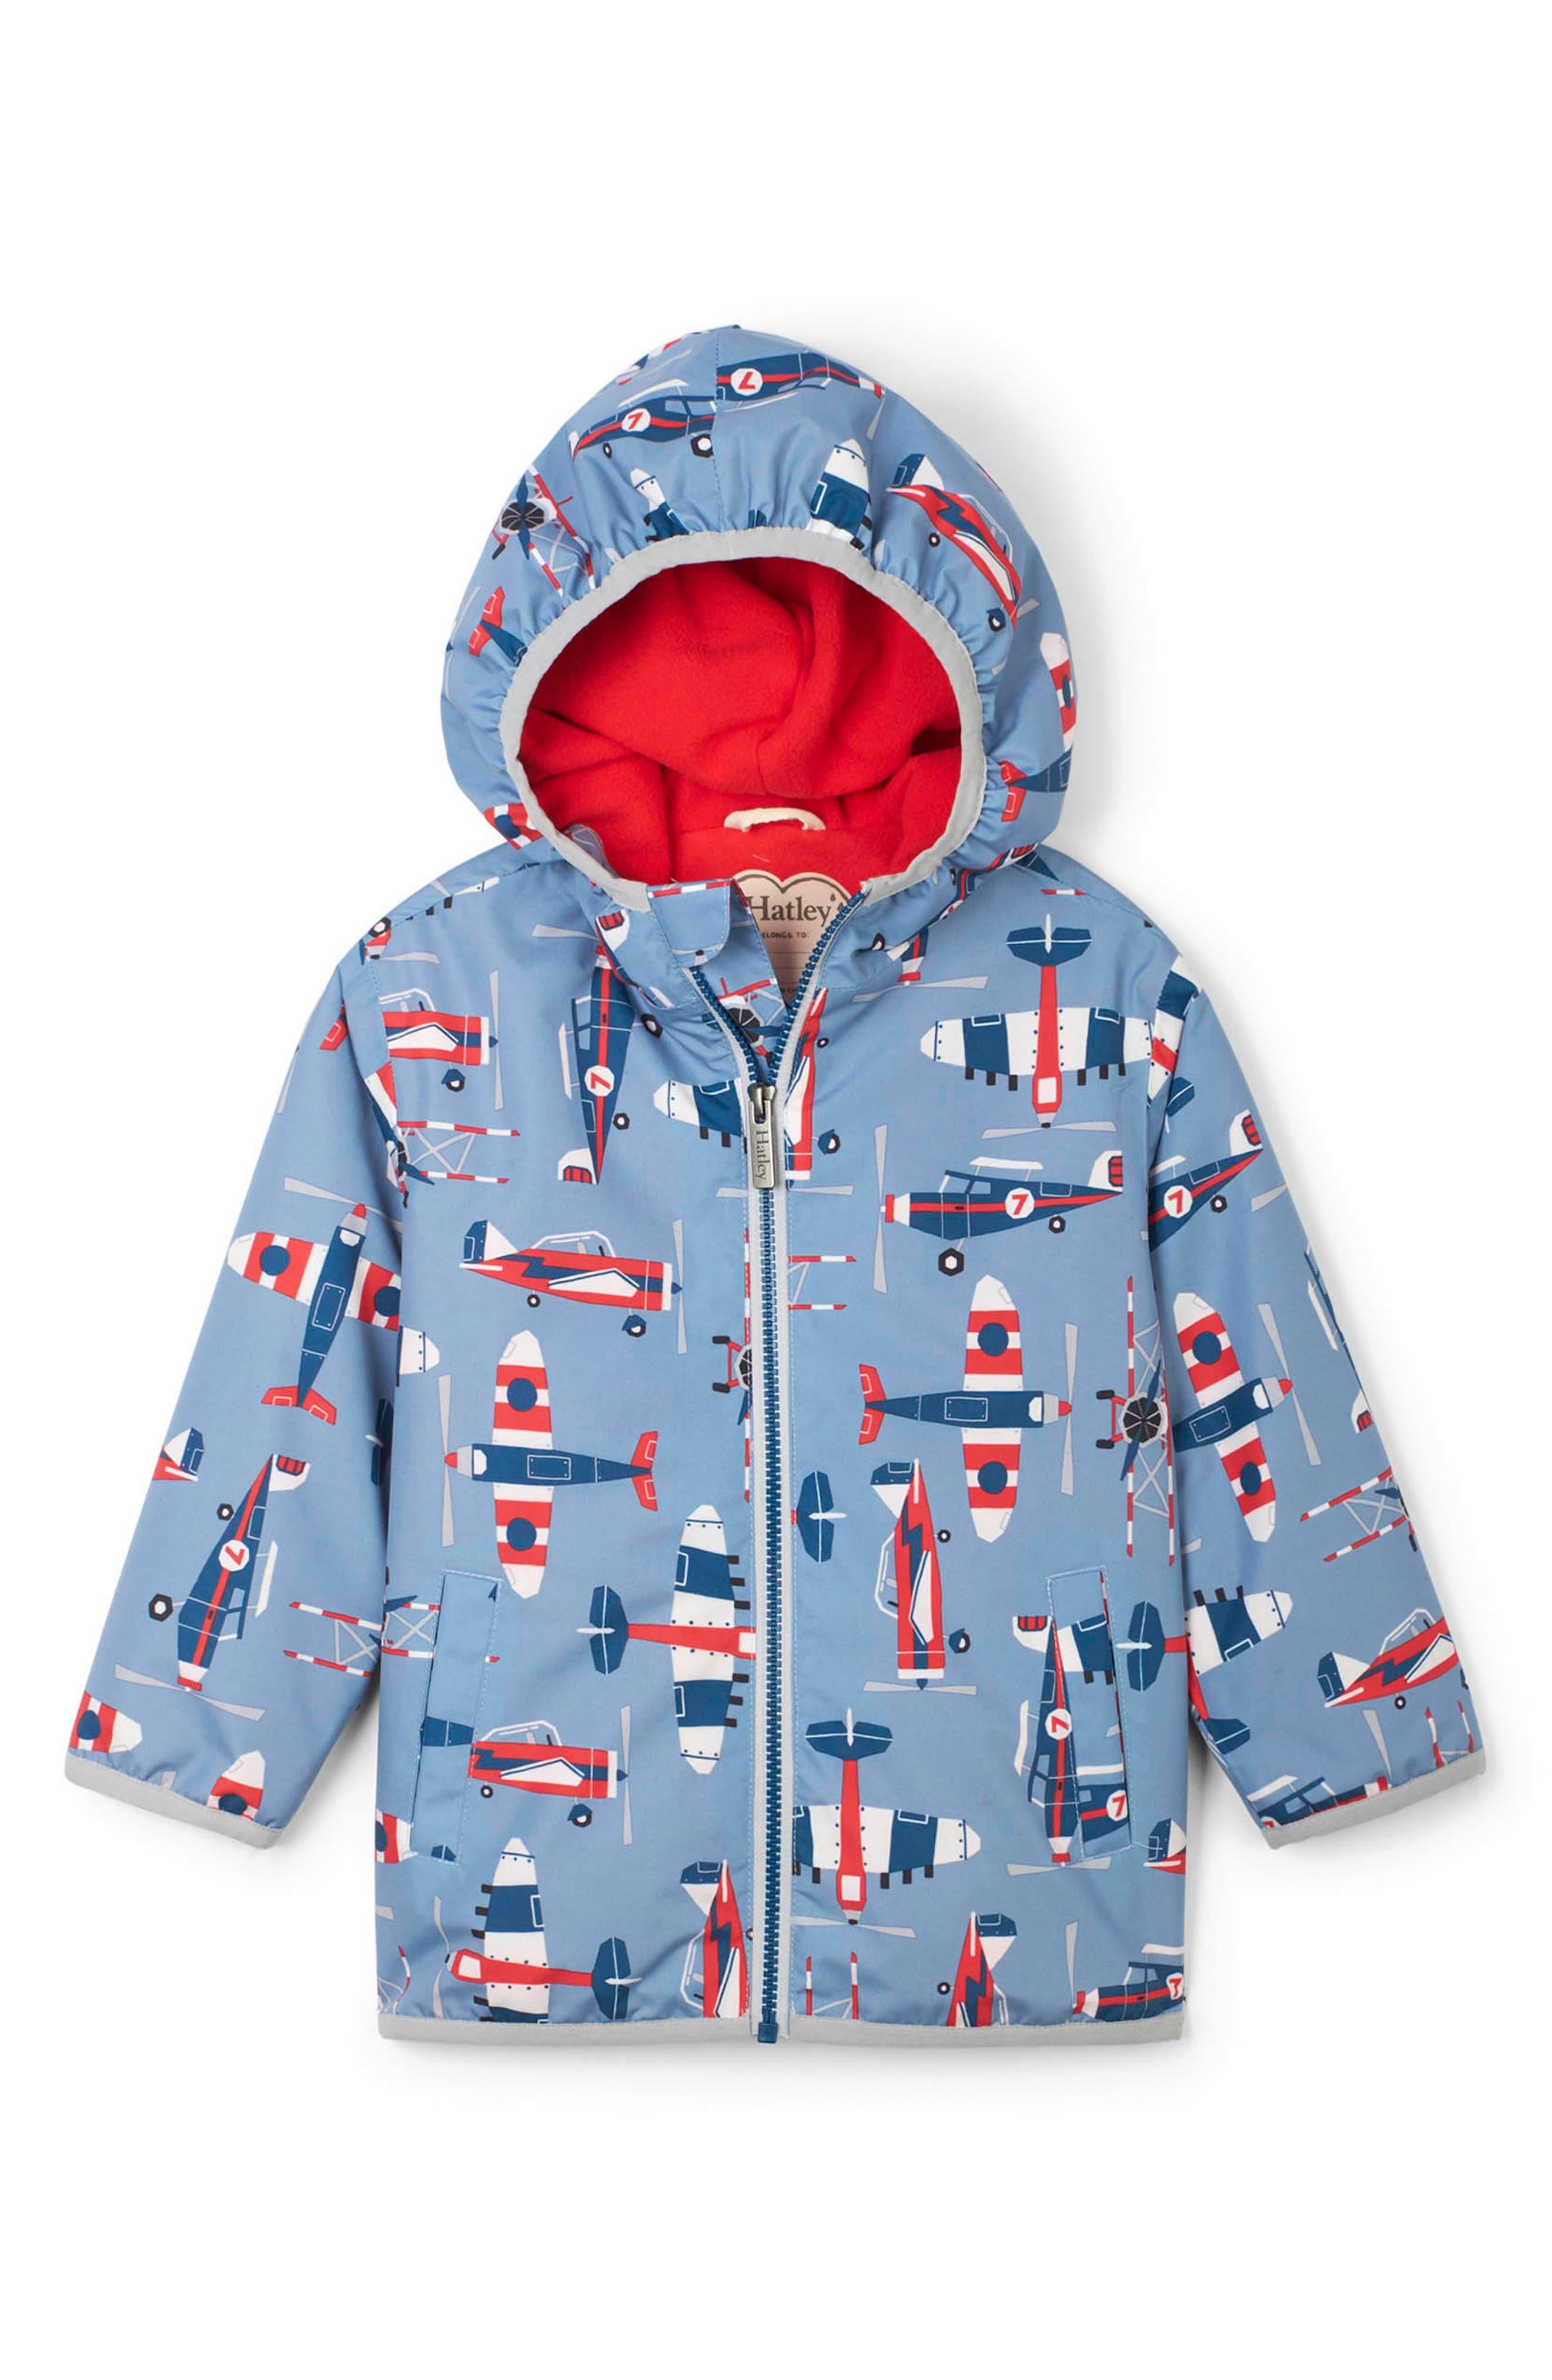 Toddler Boys Hatley Paper Planes Waterproof Hooded Raincoat Size 3T  Blue